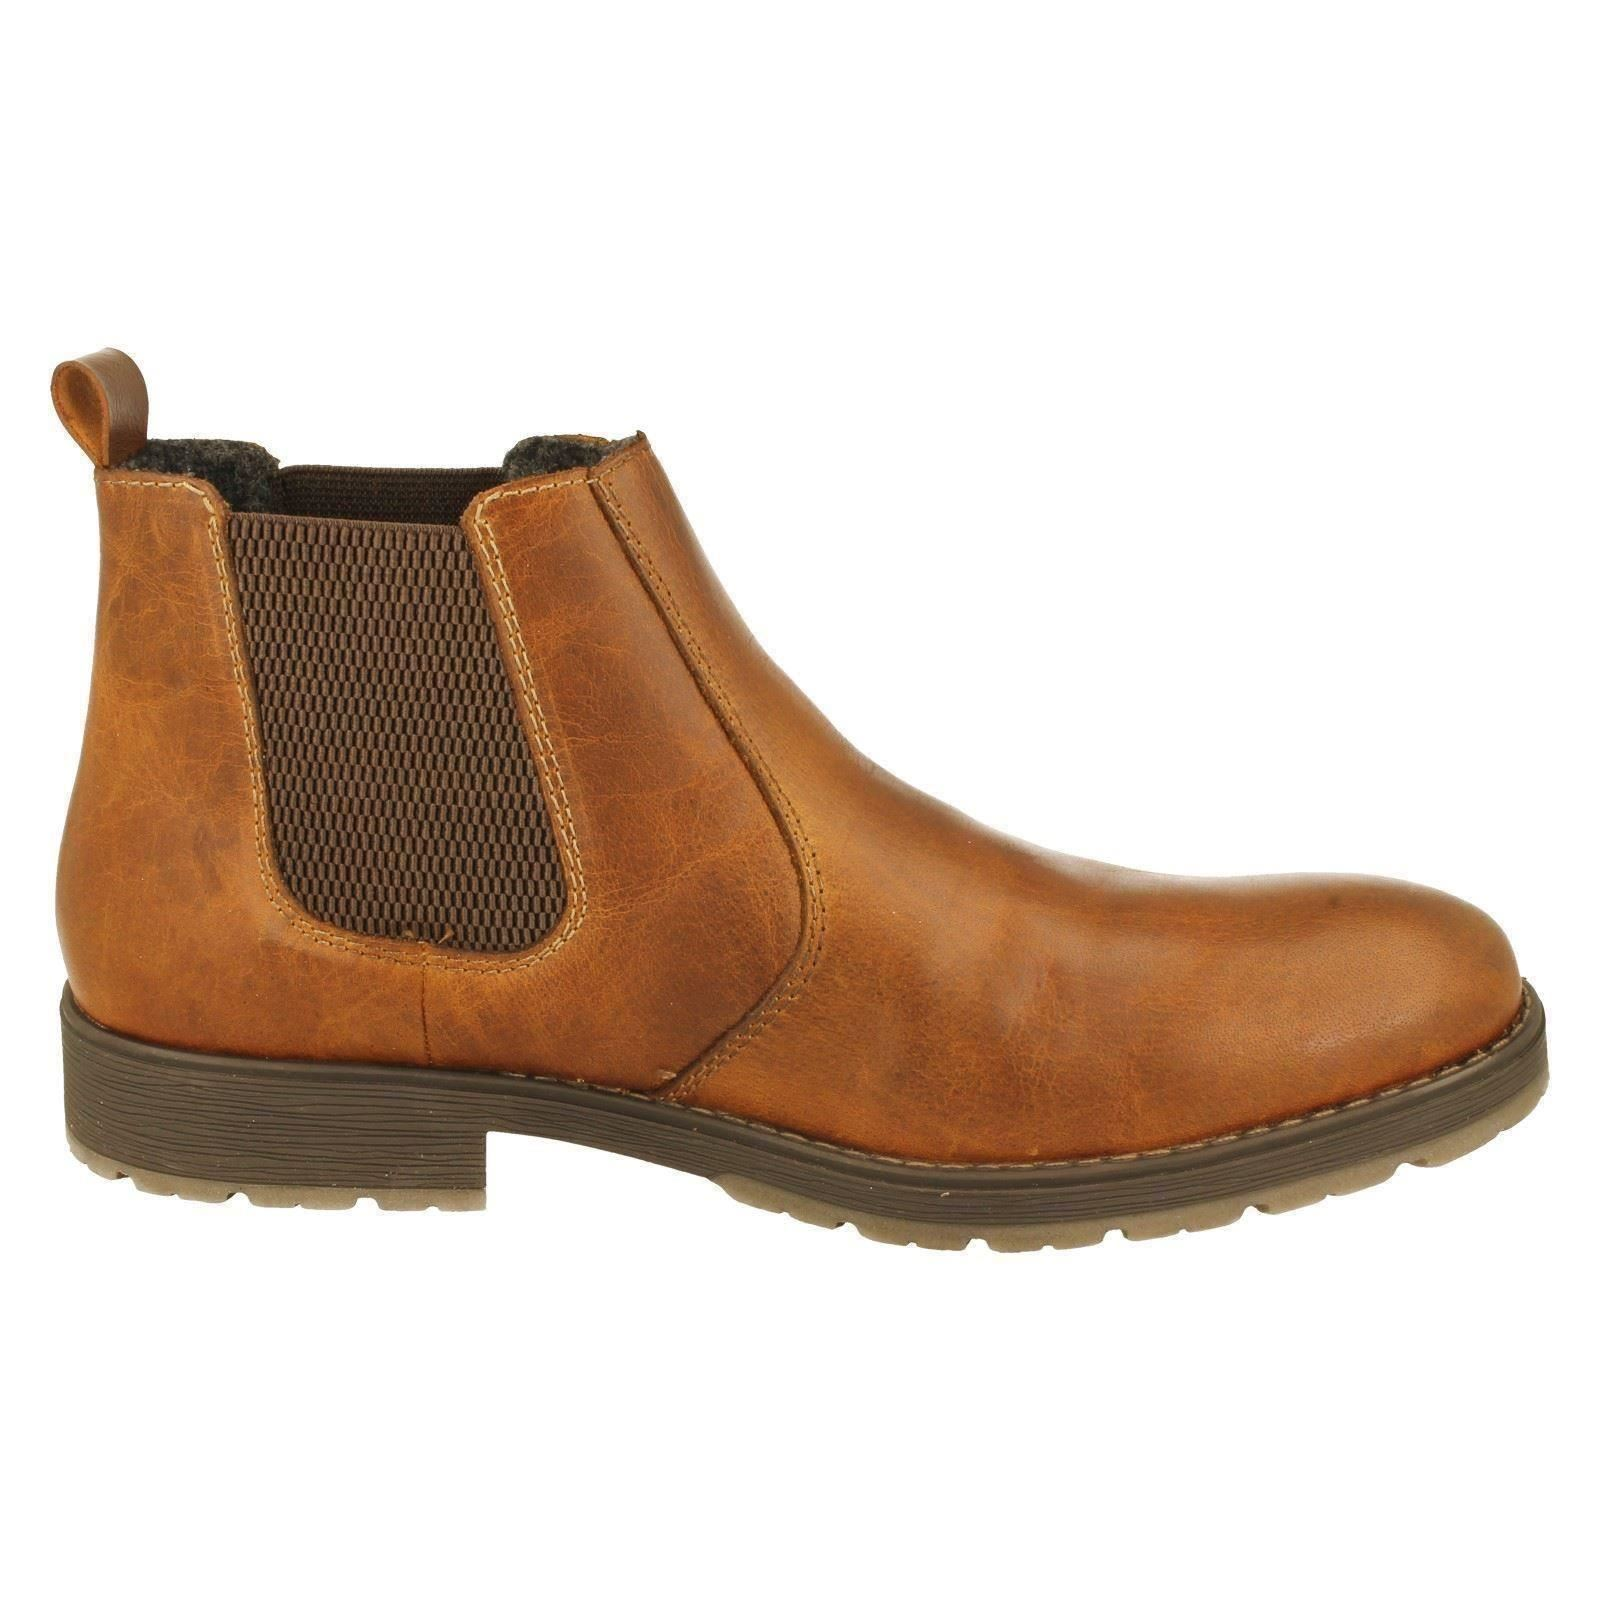 Mens Rieker Rieker Mens Boots The Style 33353-W a6344e